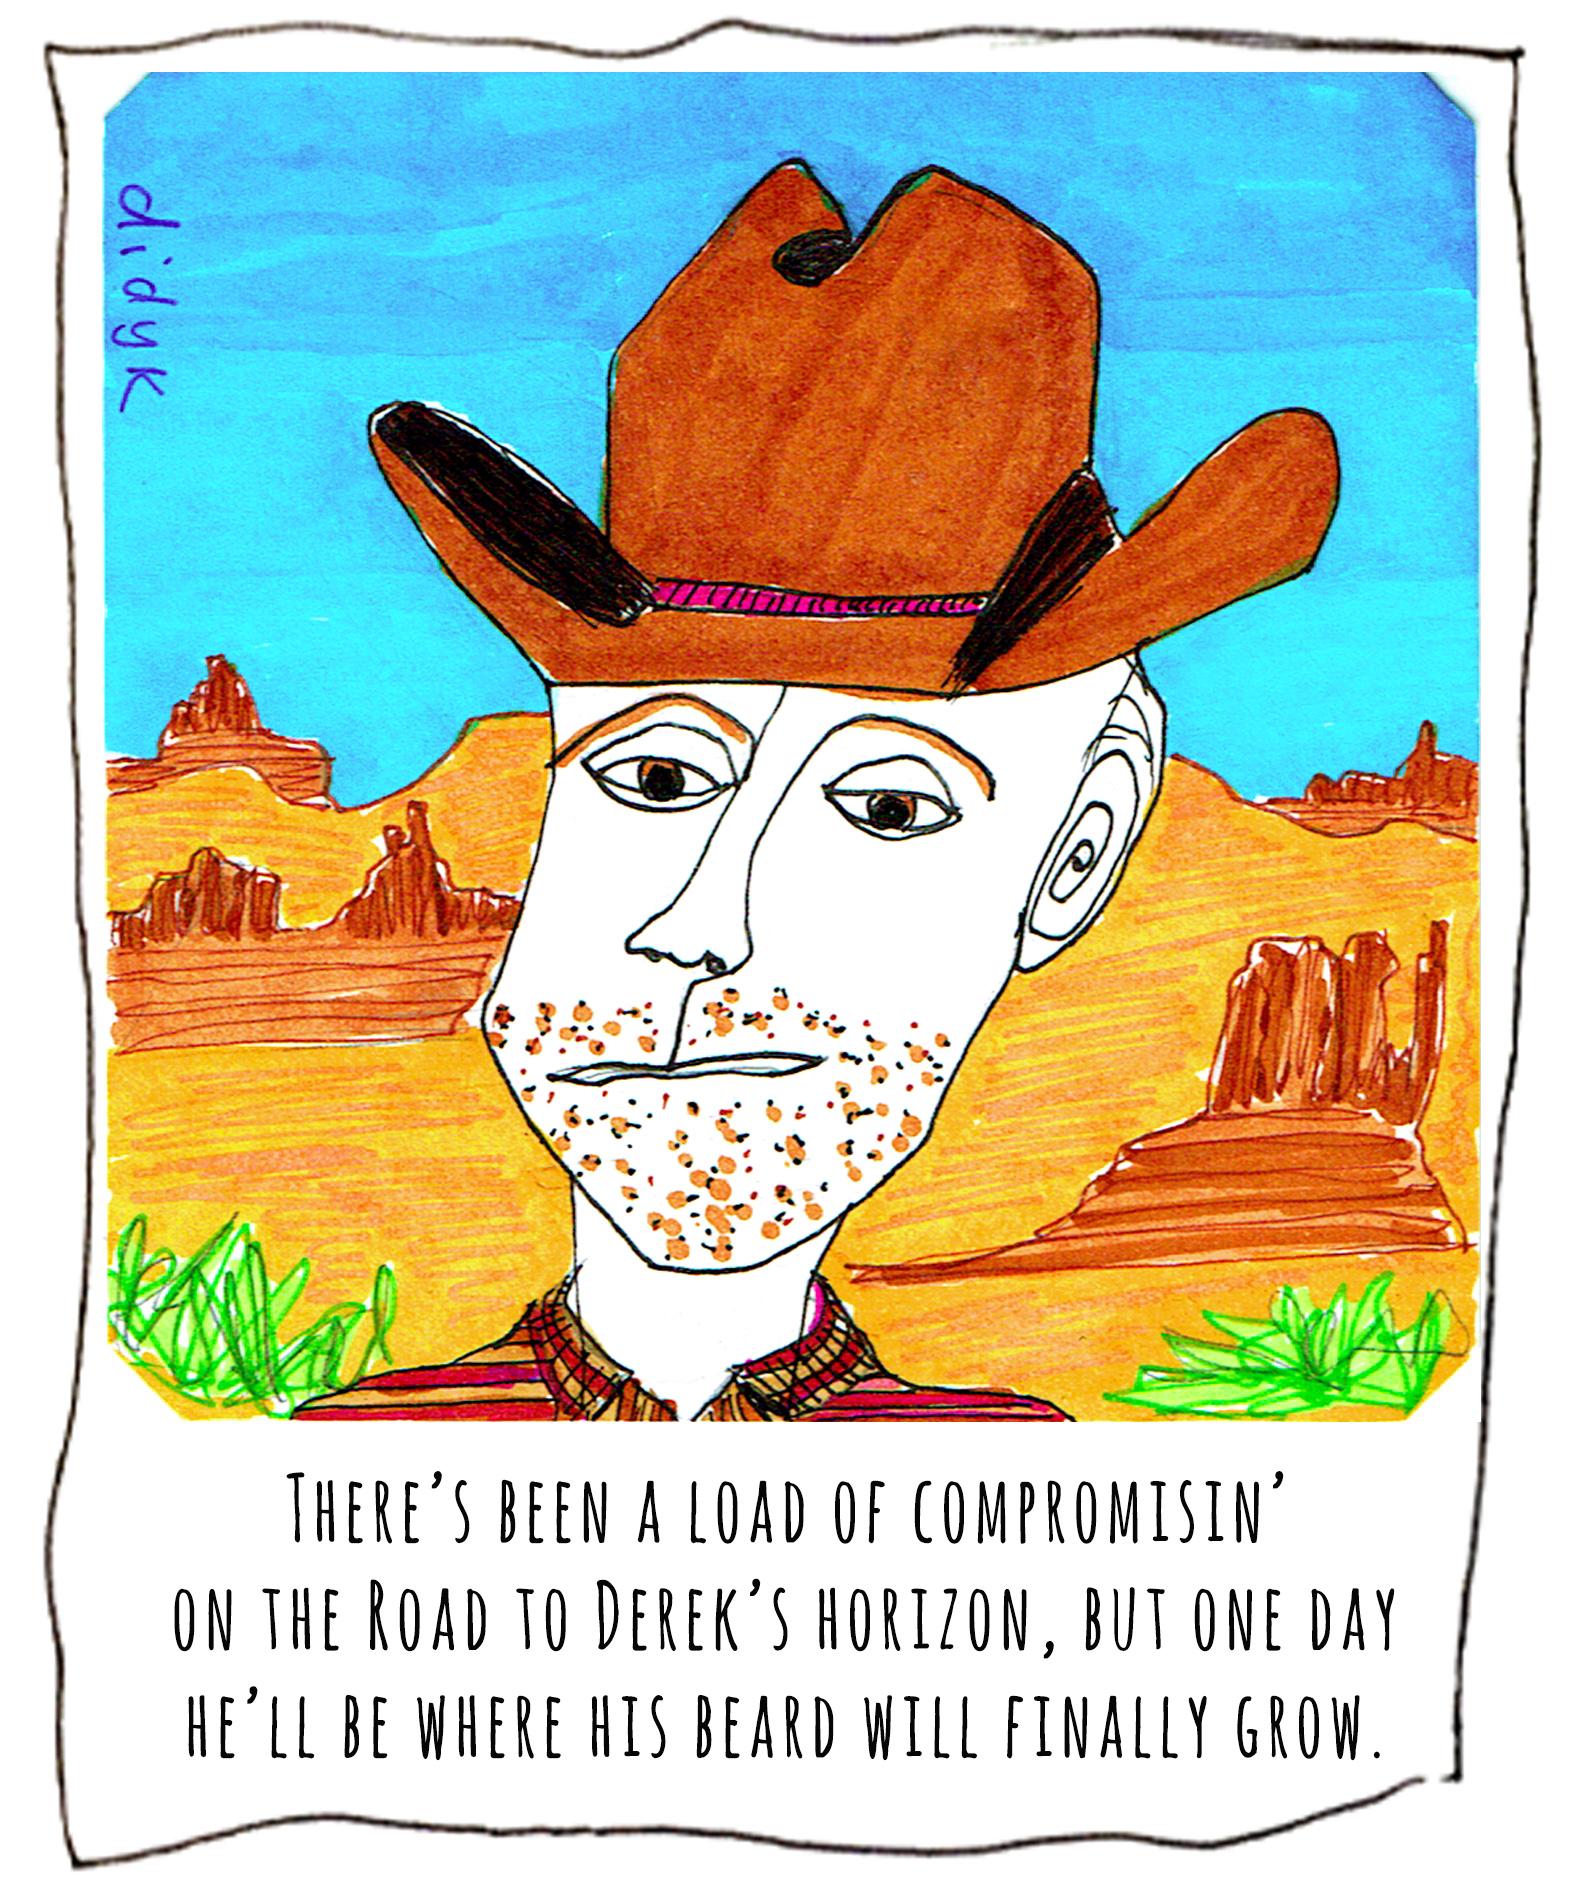 ITAK_10_Derek Cowboy.jpg